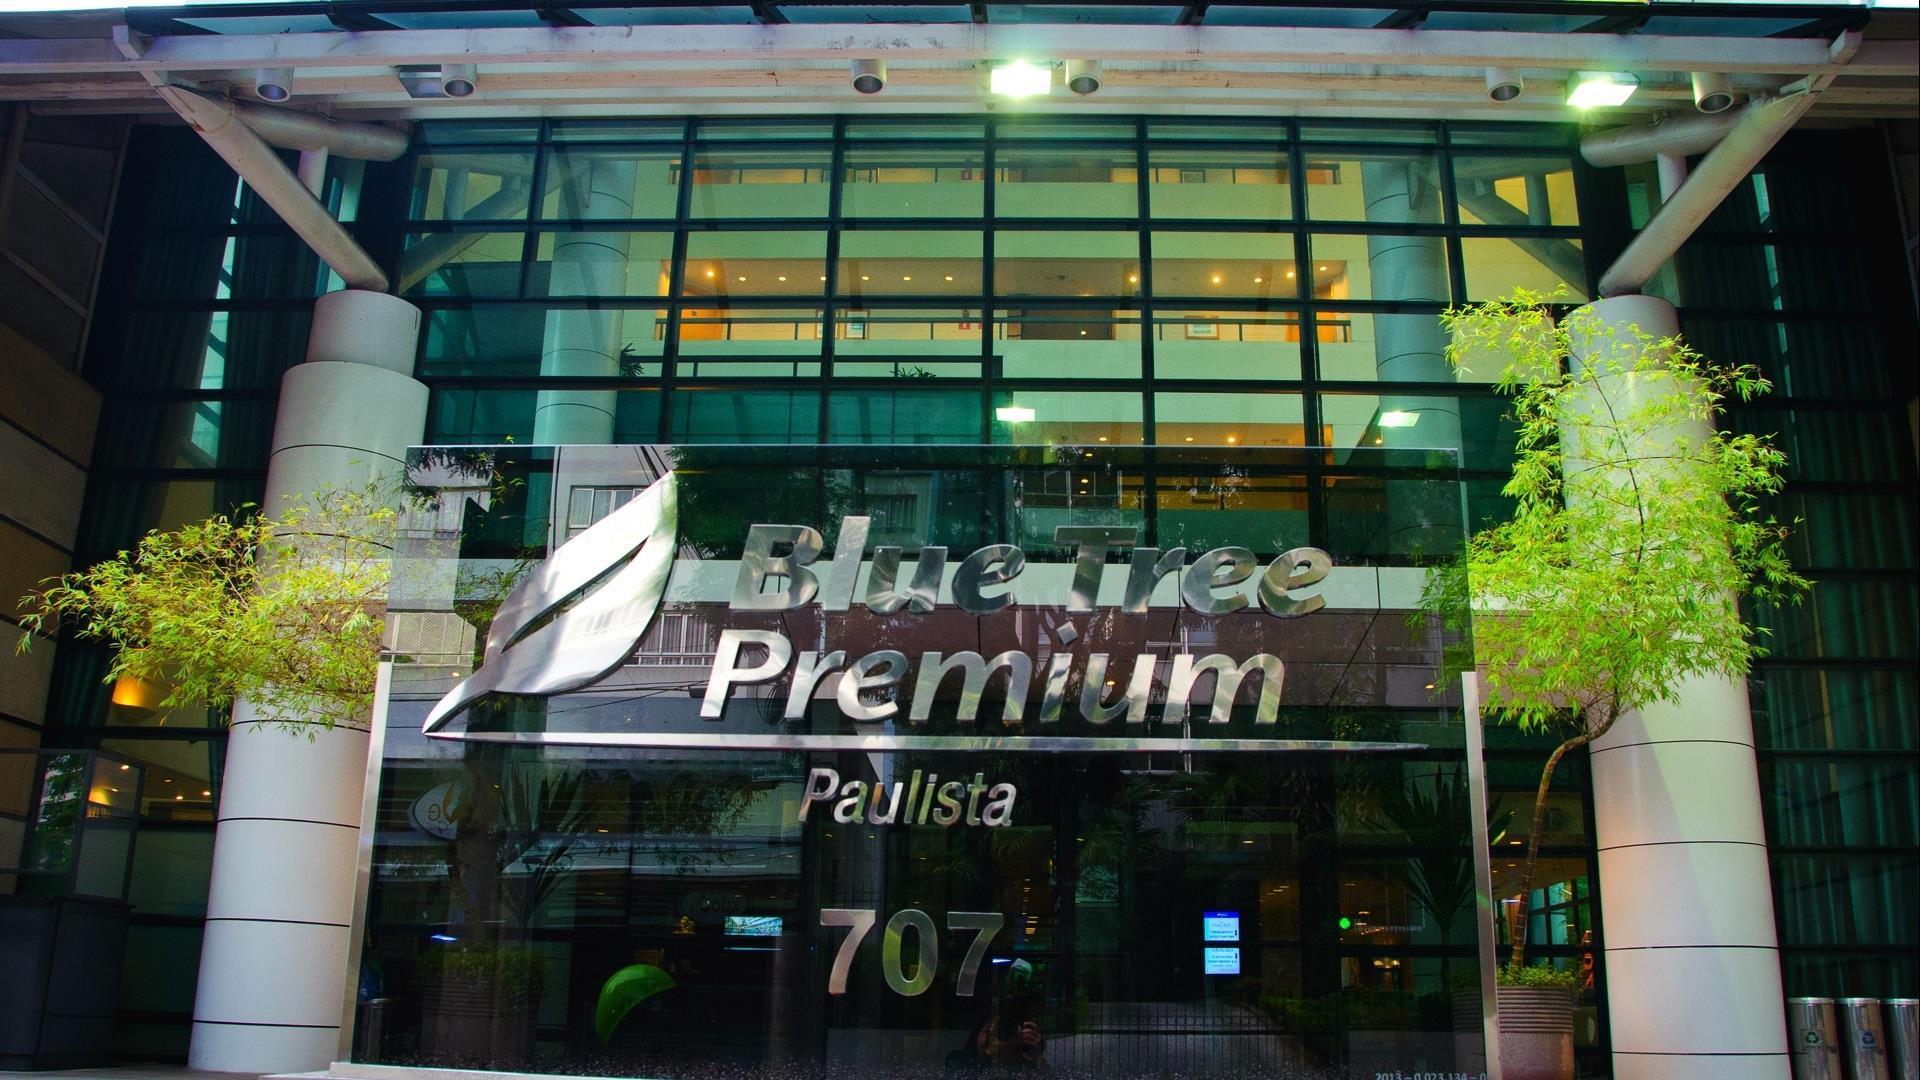 Brasilien Sao Paulo: Standard Hotel - Hotel Blue Tree Premium Paulista